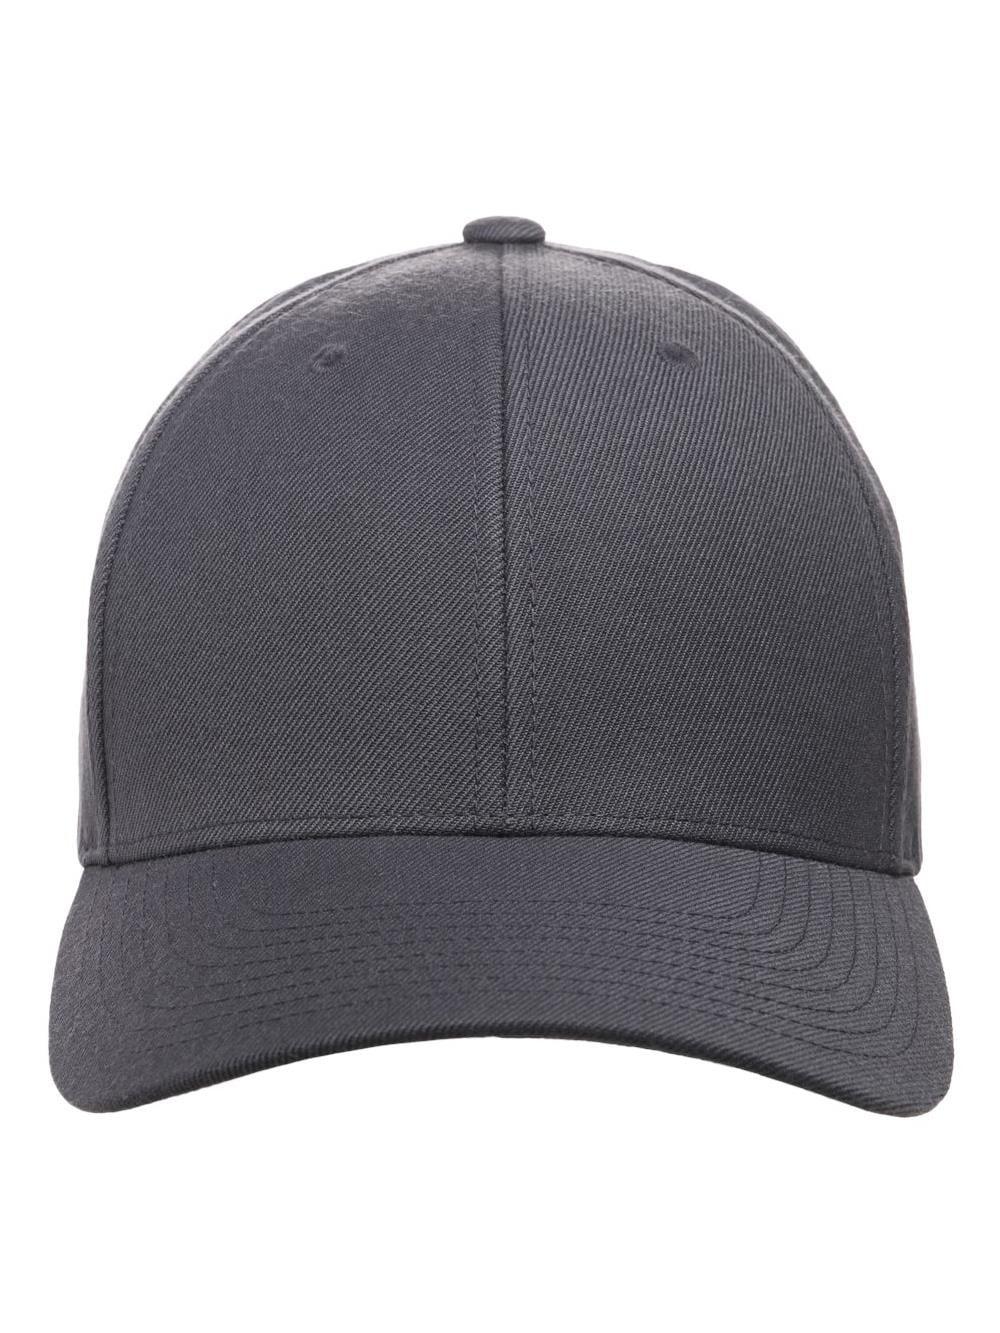 6789M Yupoong Headwear Premium Curved Visor Snapback Cap - Walmart.com d3d74fc1215